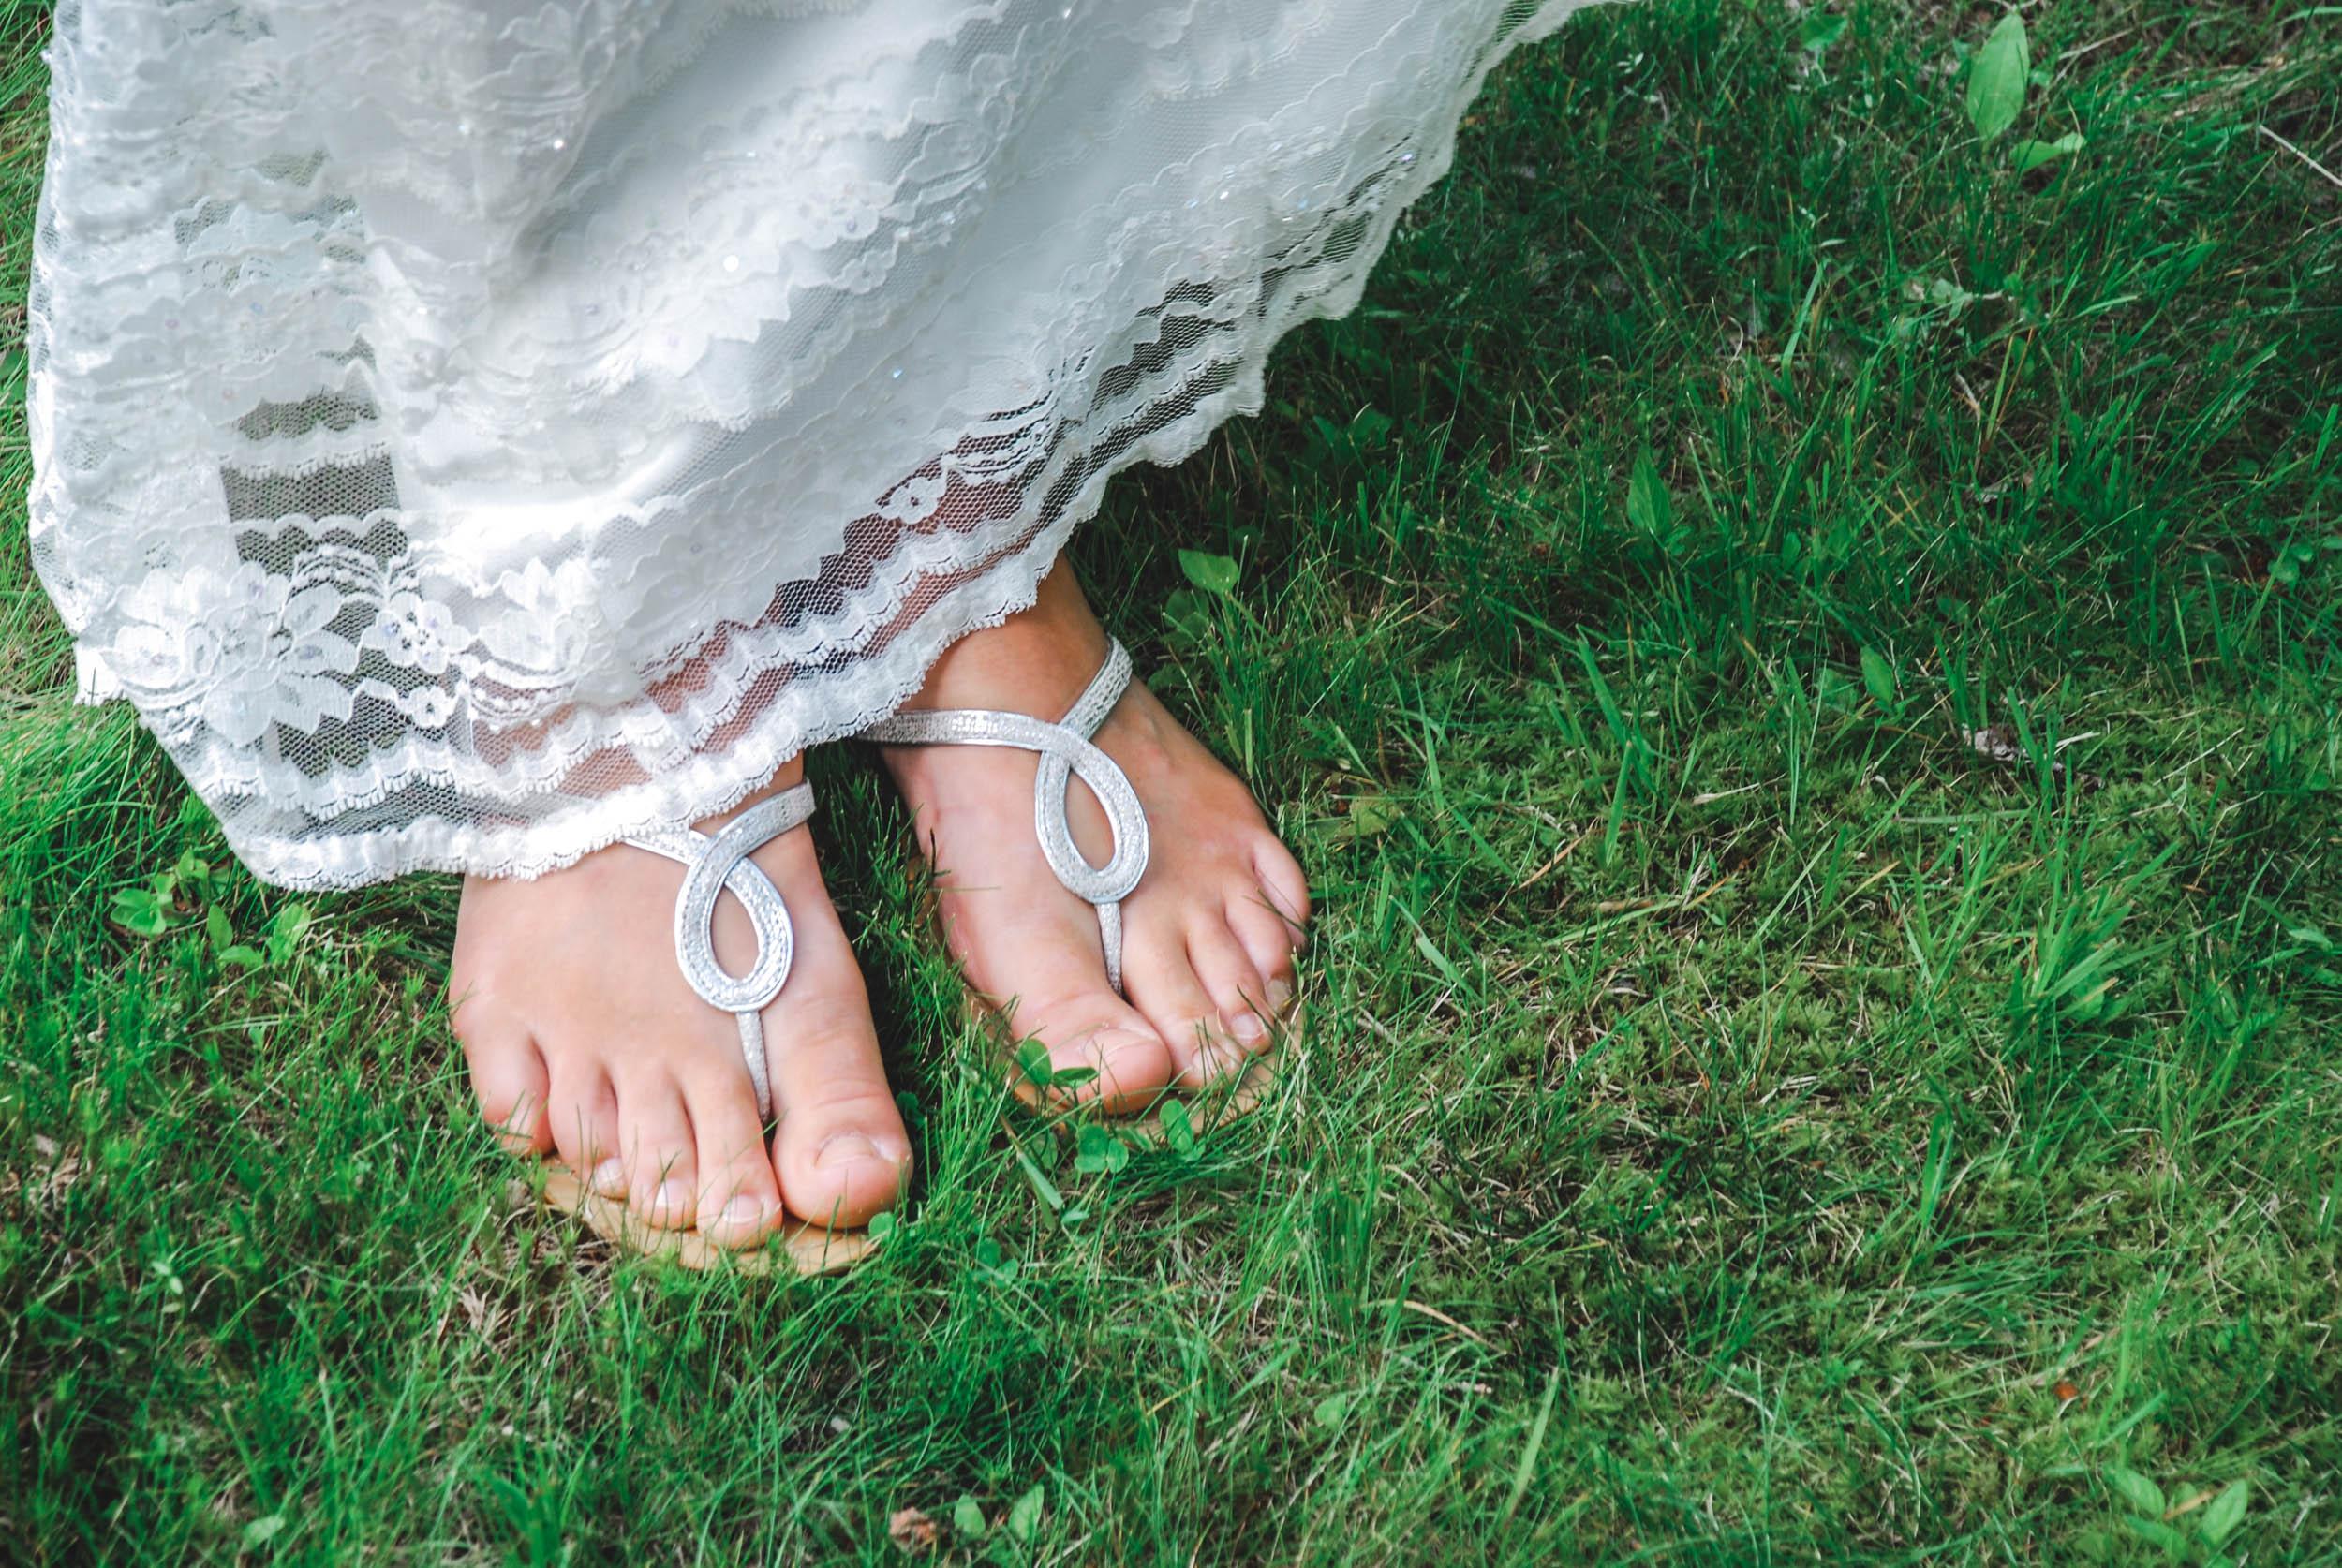 Wisconsin bride's feet in grass